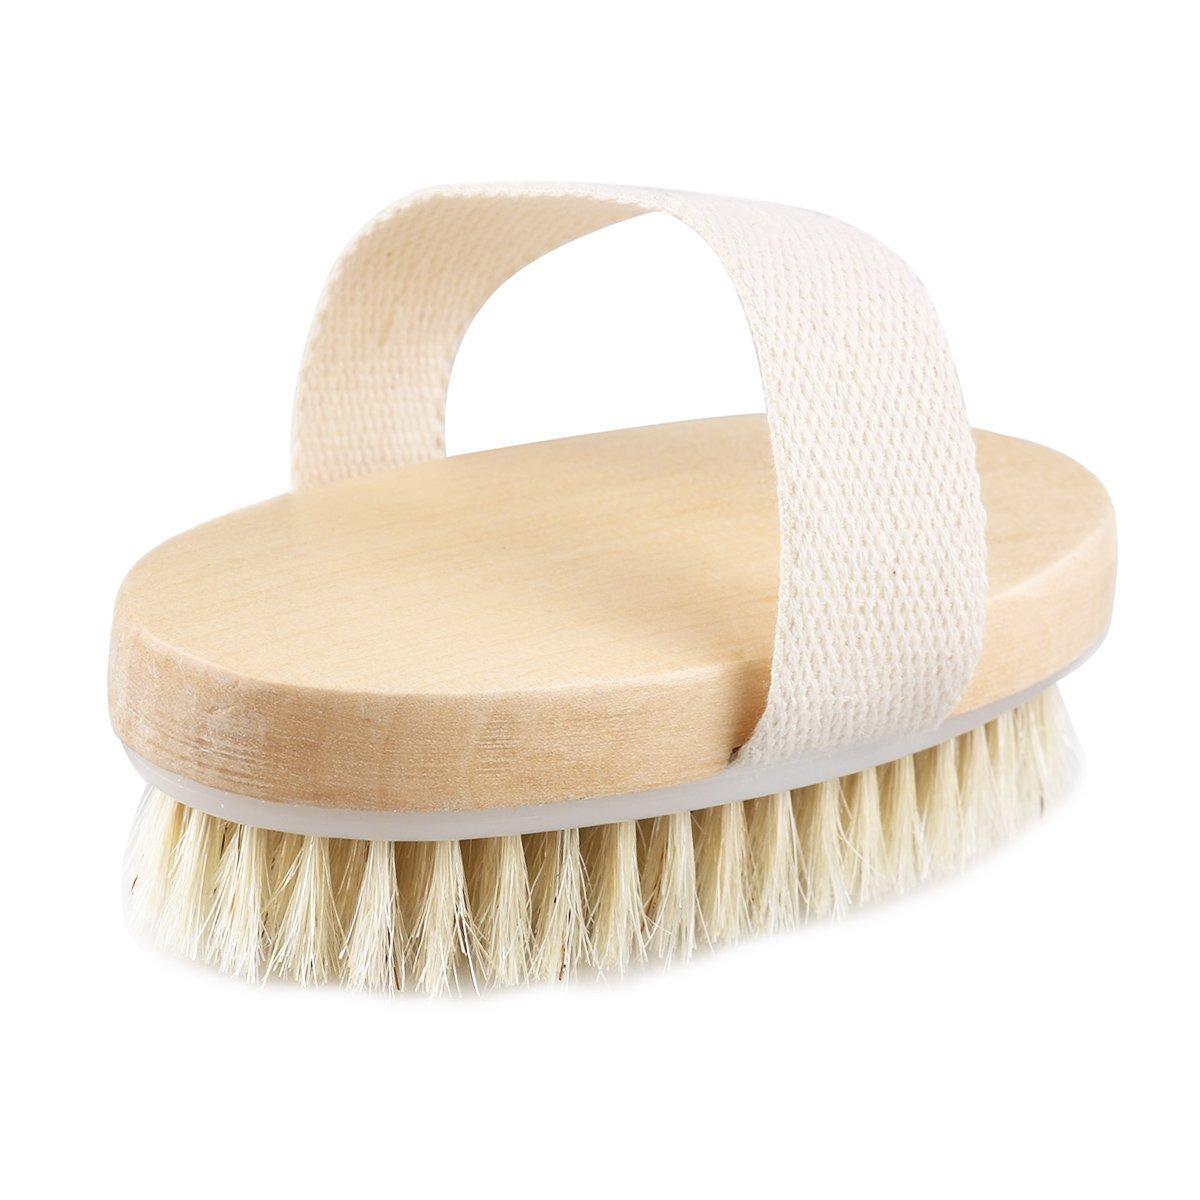 Pixnor Wooden Body Brush Massager Bath Shower Back Spa Scrubber